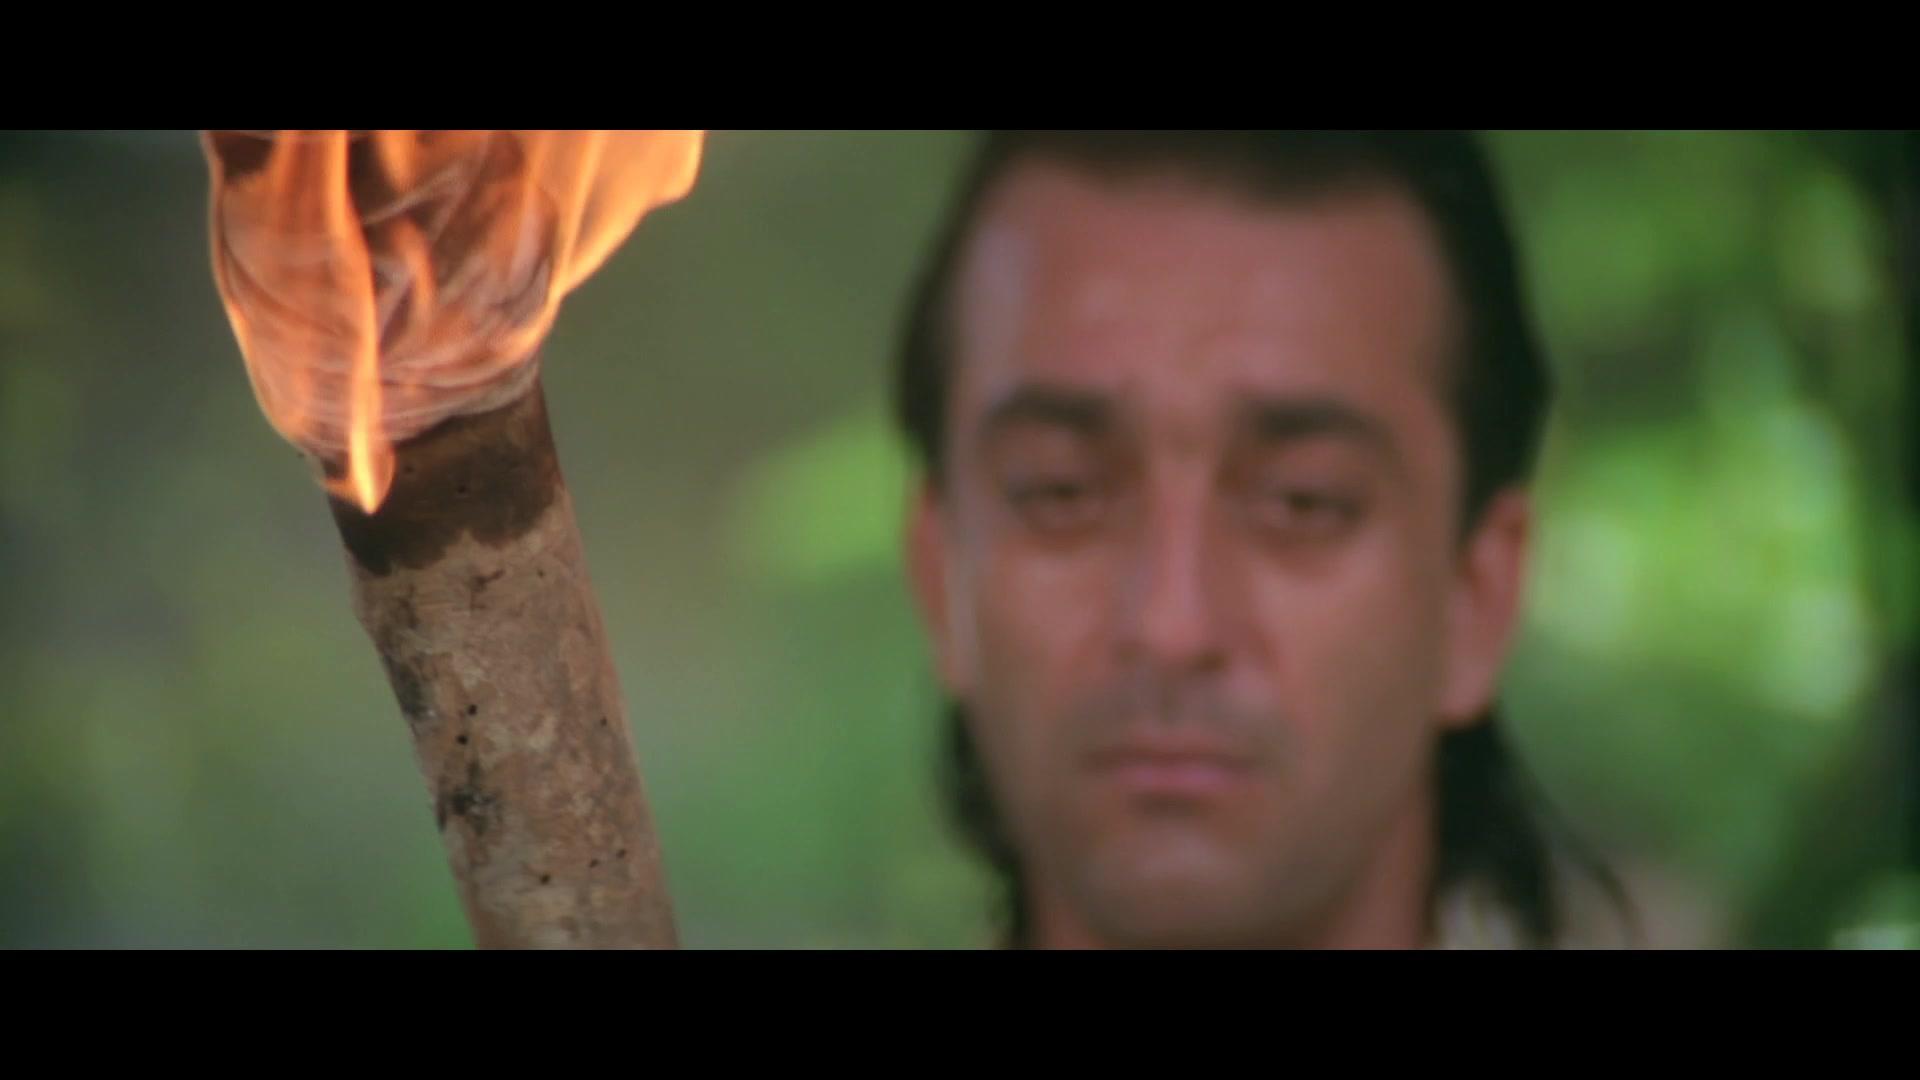 Aatish 1994 Untouched 1080p AMZN WEB DL AVC E AC3 E Subs DrC